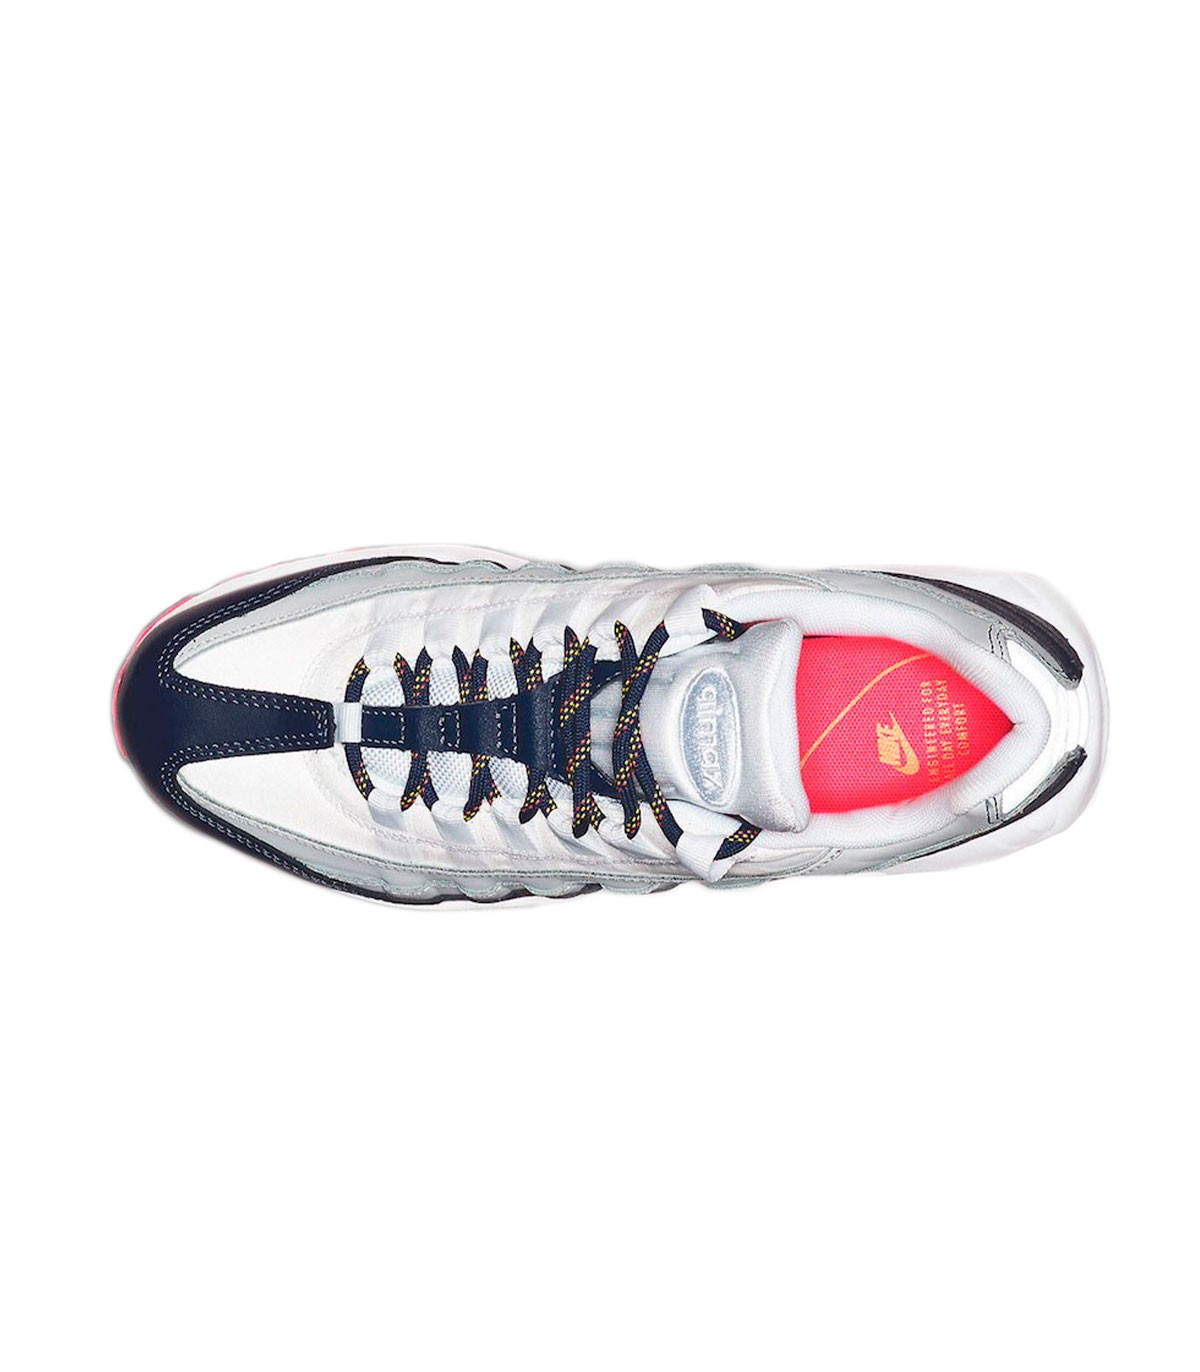 Max Zapatillas Air Nike 95Moda Comprar 0mNvOn8w